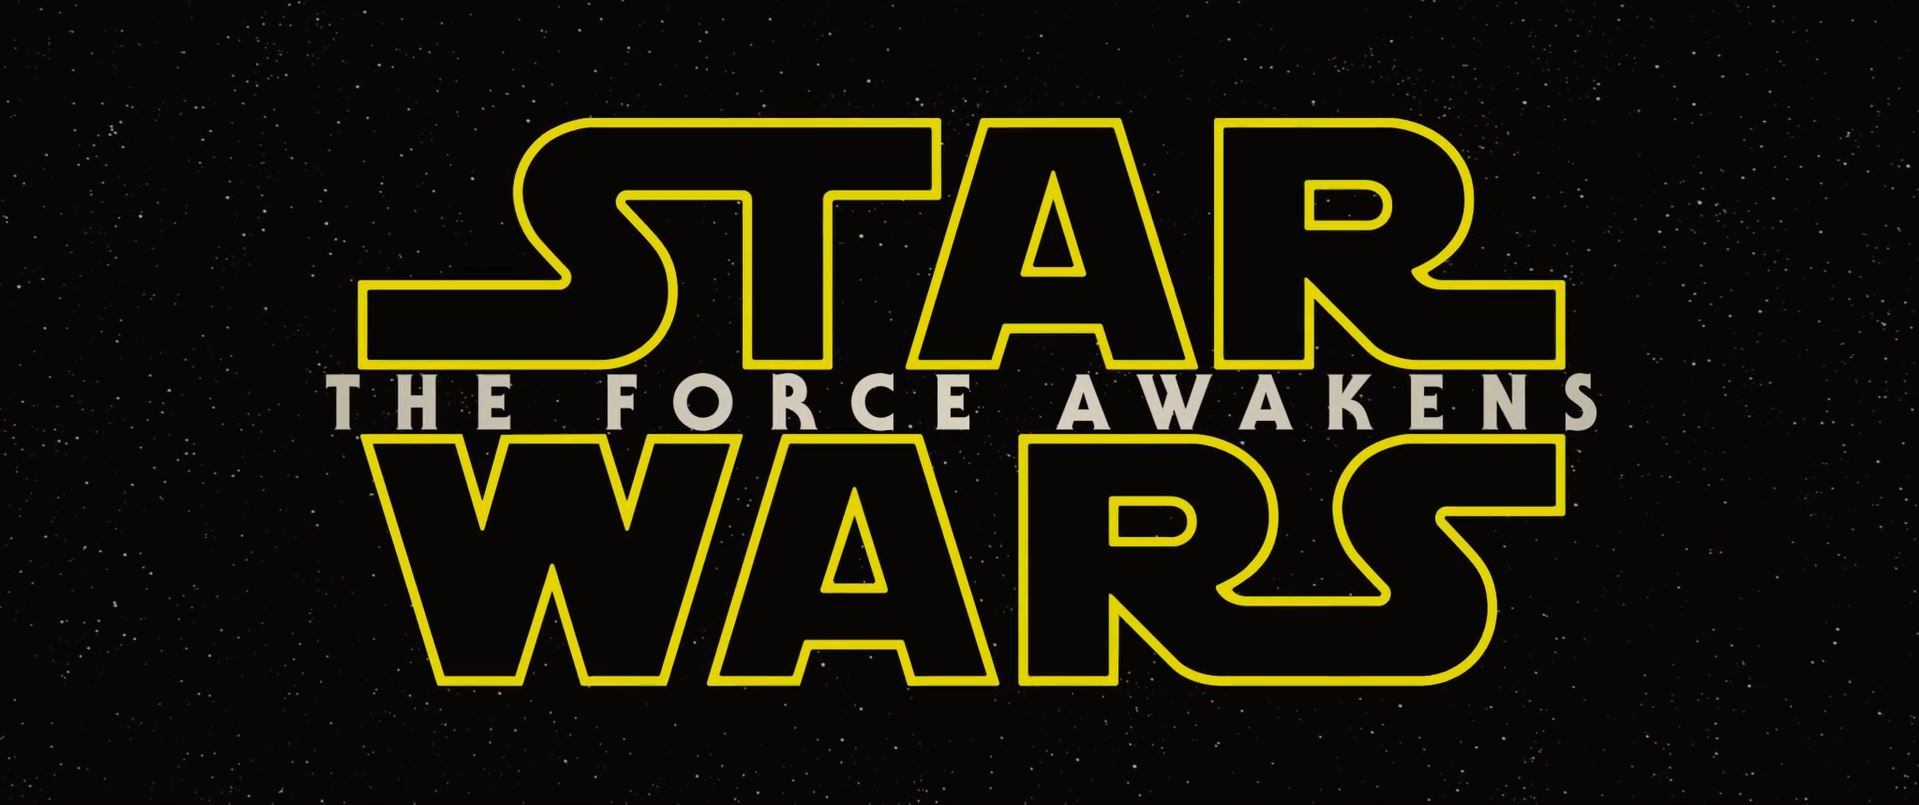 The Force Awakens Logo - Star Wars Episode 7 trailer released